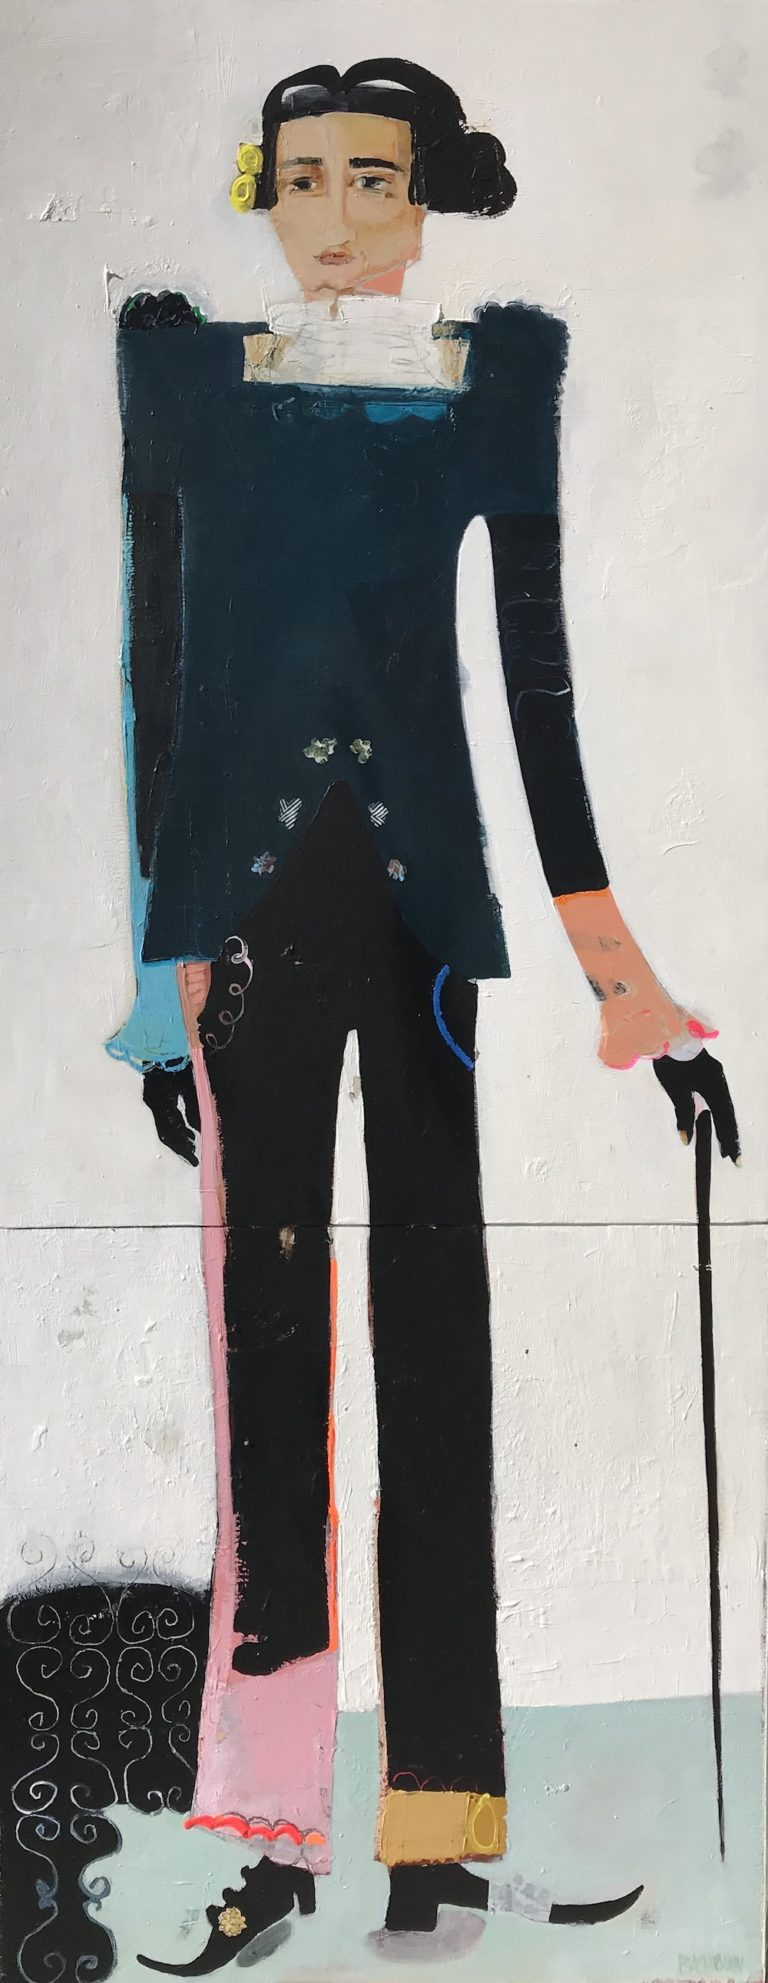 Parisian Stroll by Constance Bachmann